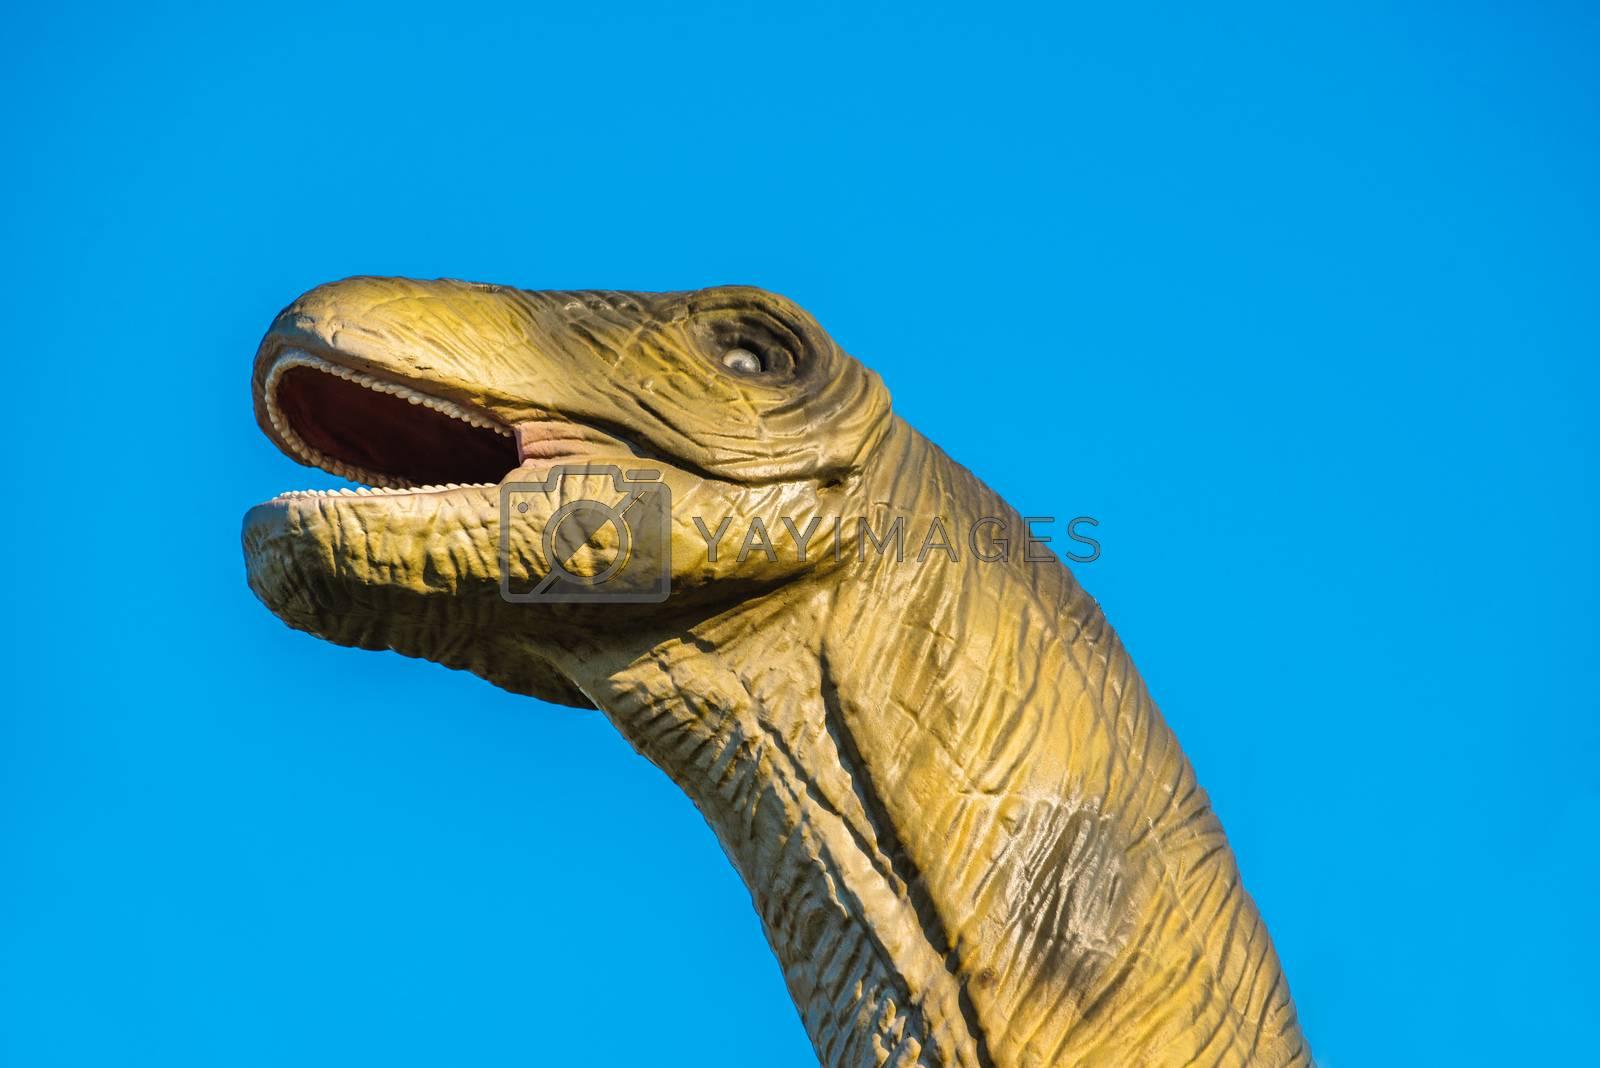 NOVI SAD, SERBIA - AUGUST 5, 2016: Brontosaurus life size model of prehistoric animal in theme entertainment Dino Park. Species of Brontosaurus range in age from 155 to 152 million years ago.